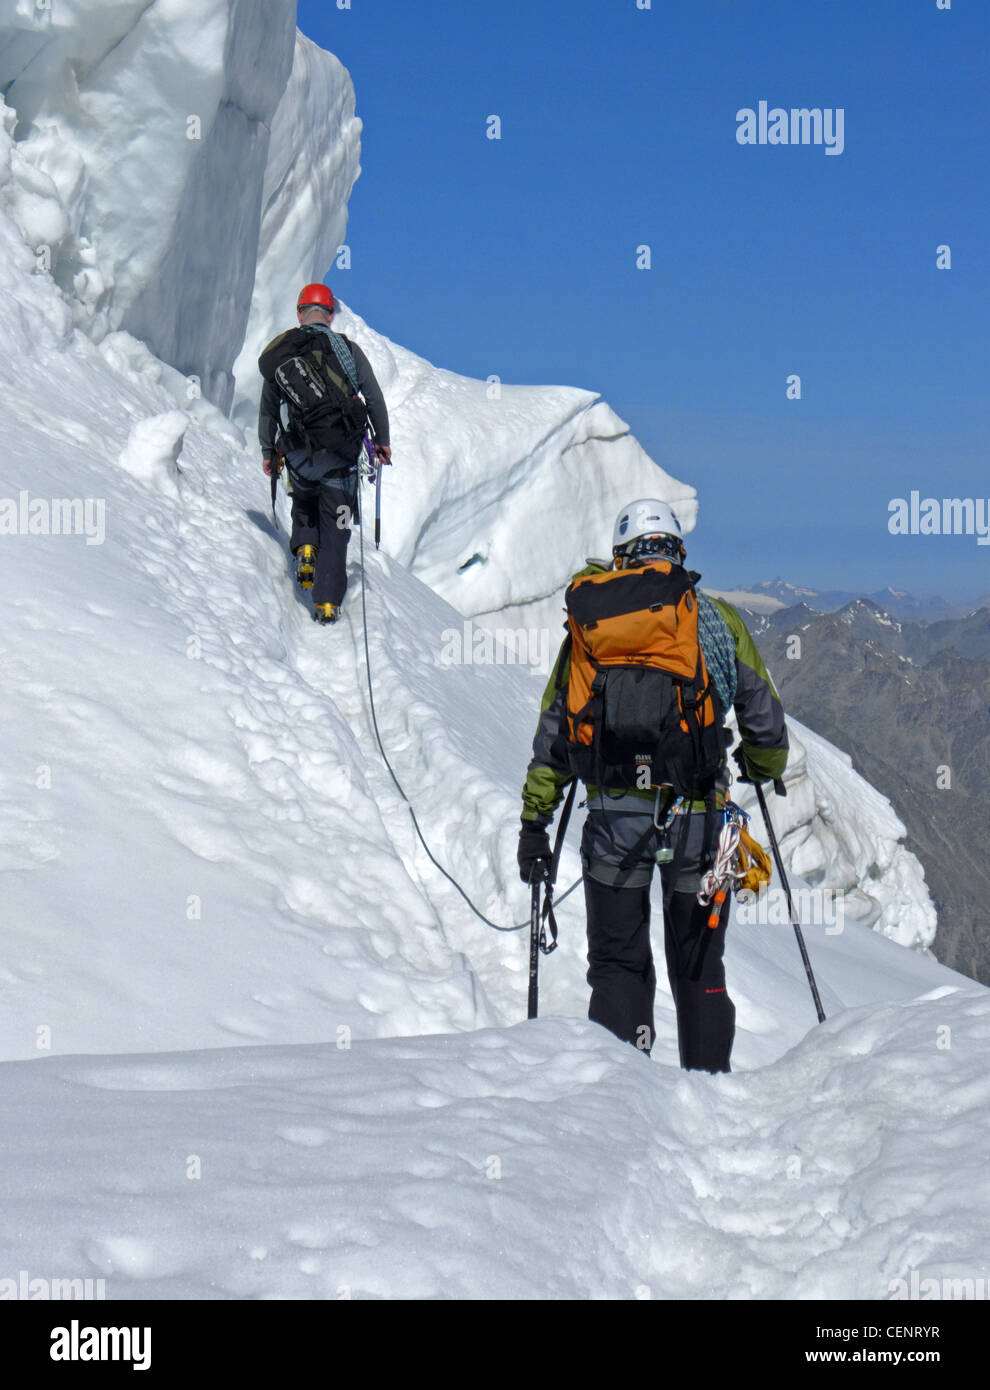 Alpine climbing on the Weissmiess Switzerland Stock Photo